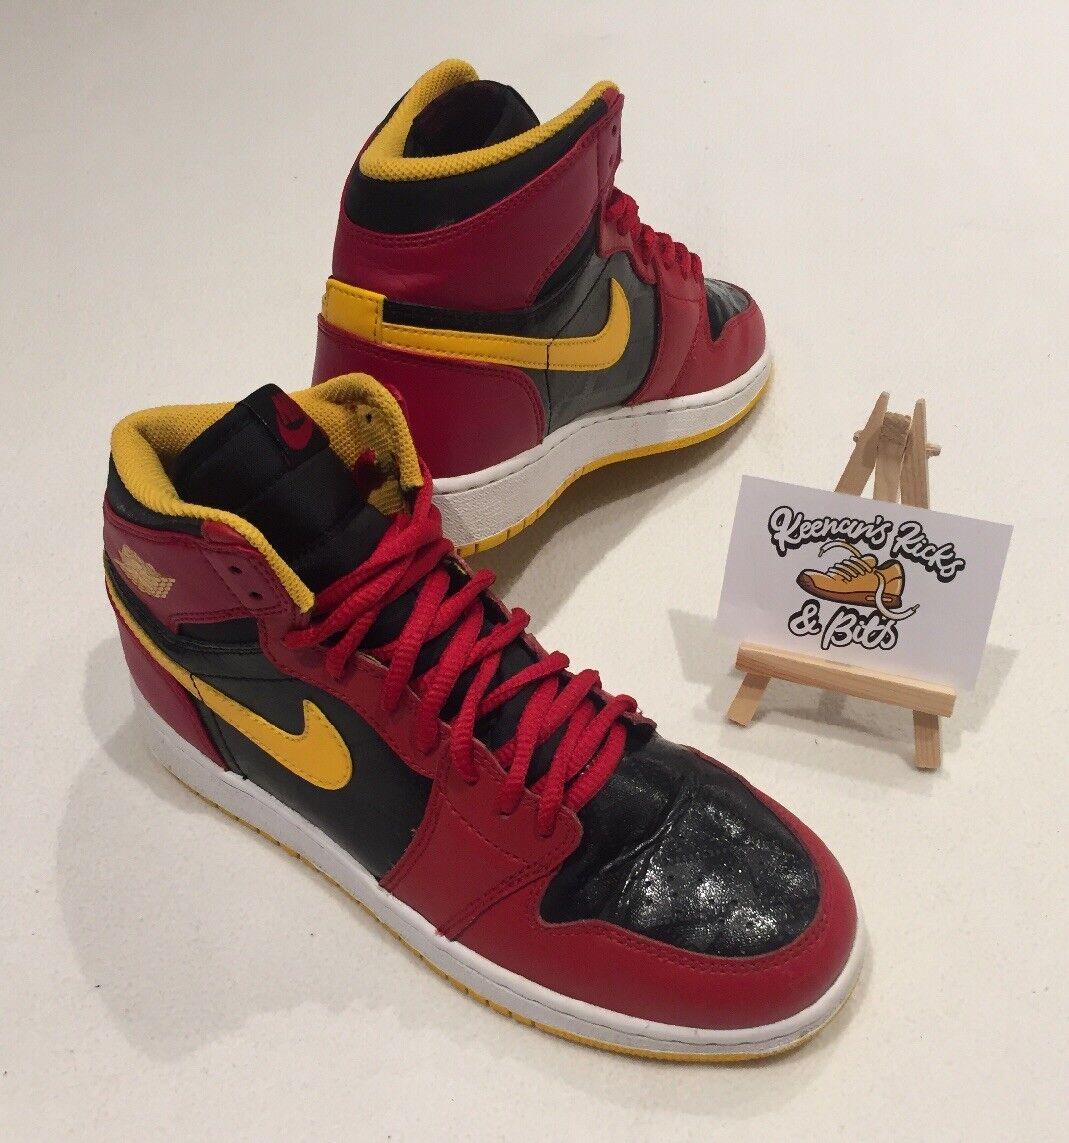 Femme Nike Air Jordan 1 Retro Atlanta Hawks Basketball Baskets UK 4.5